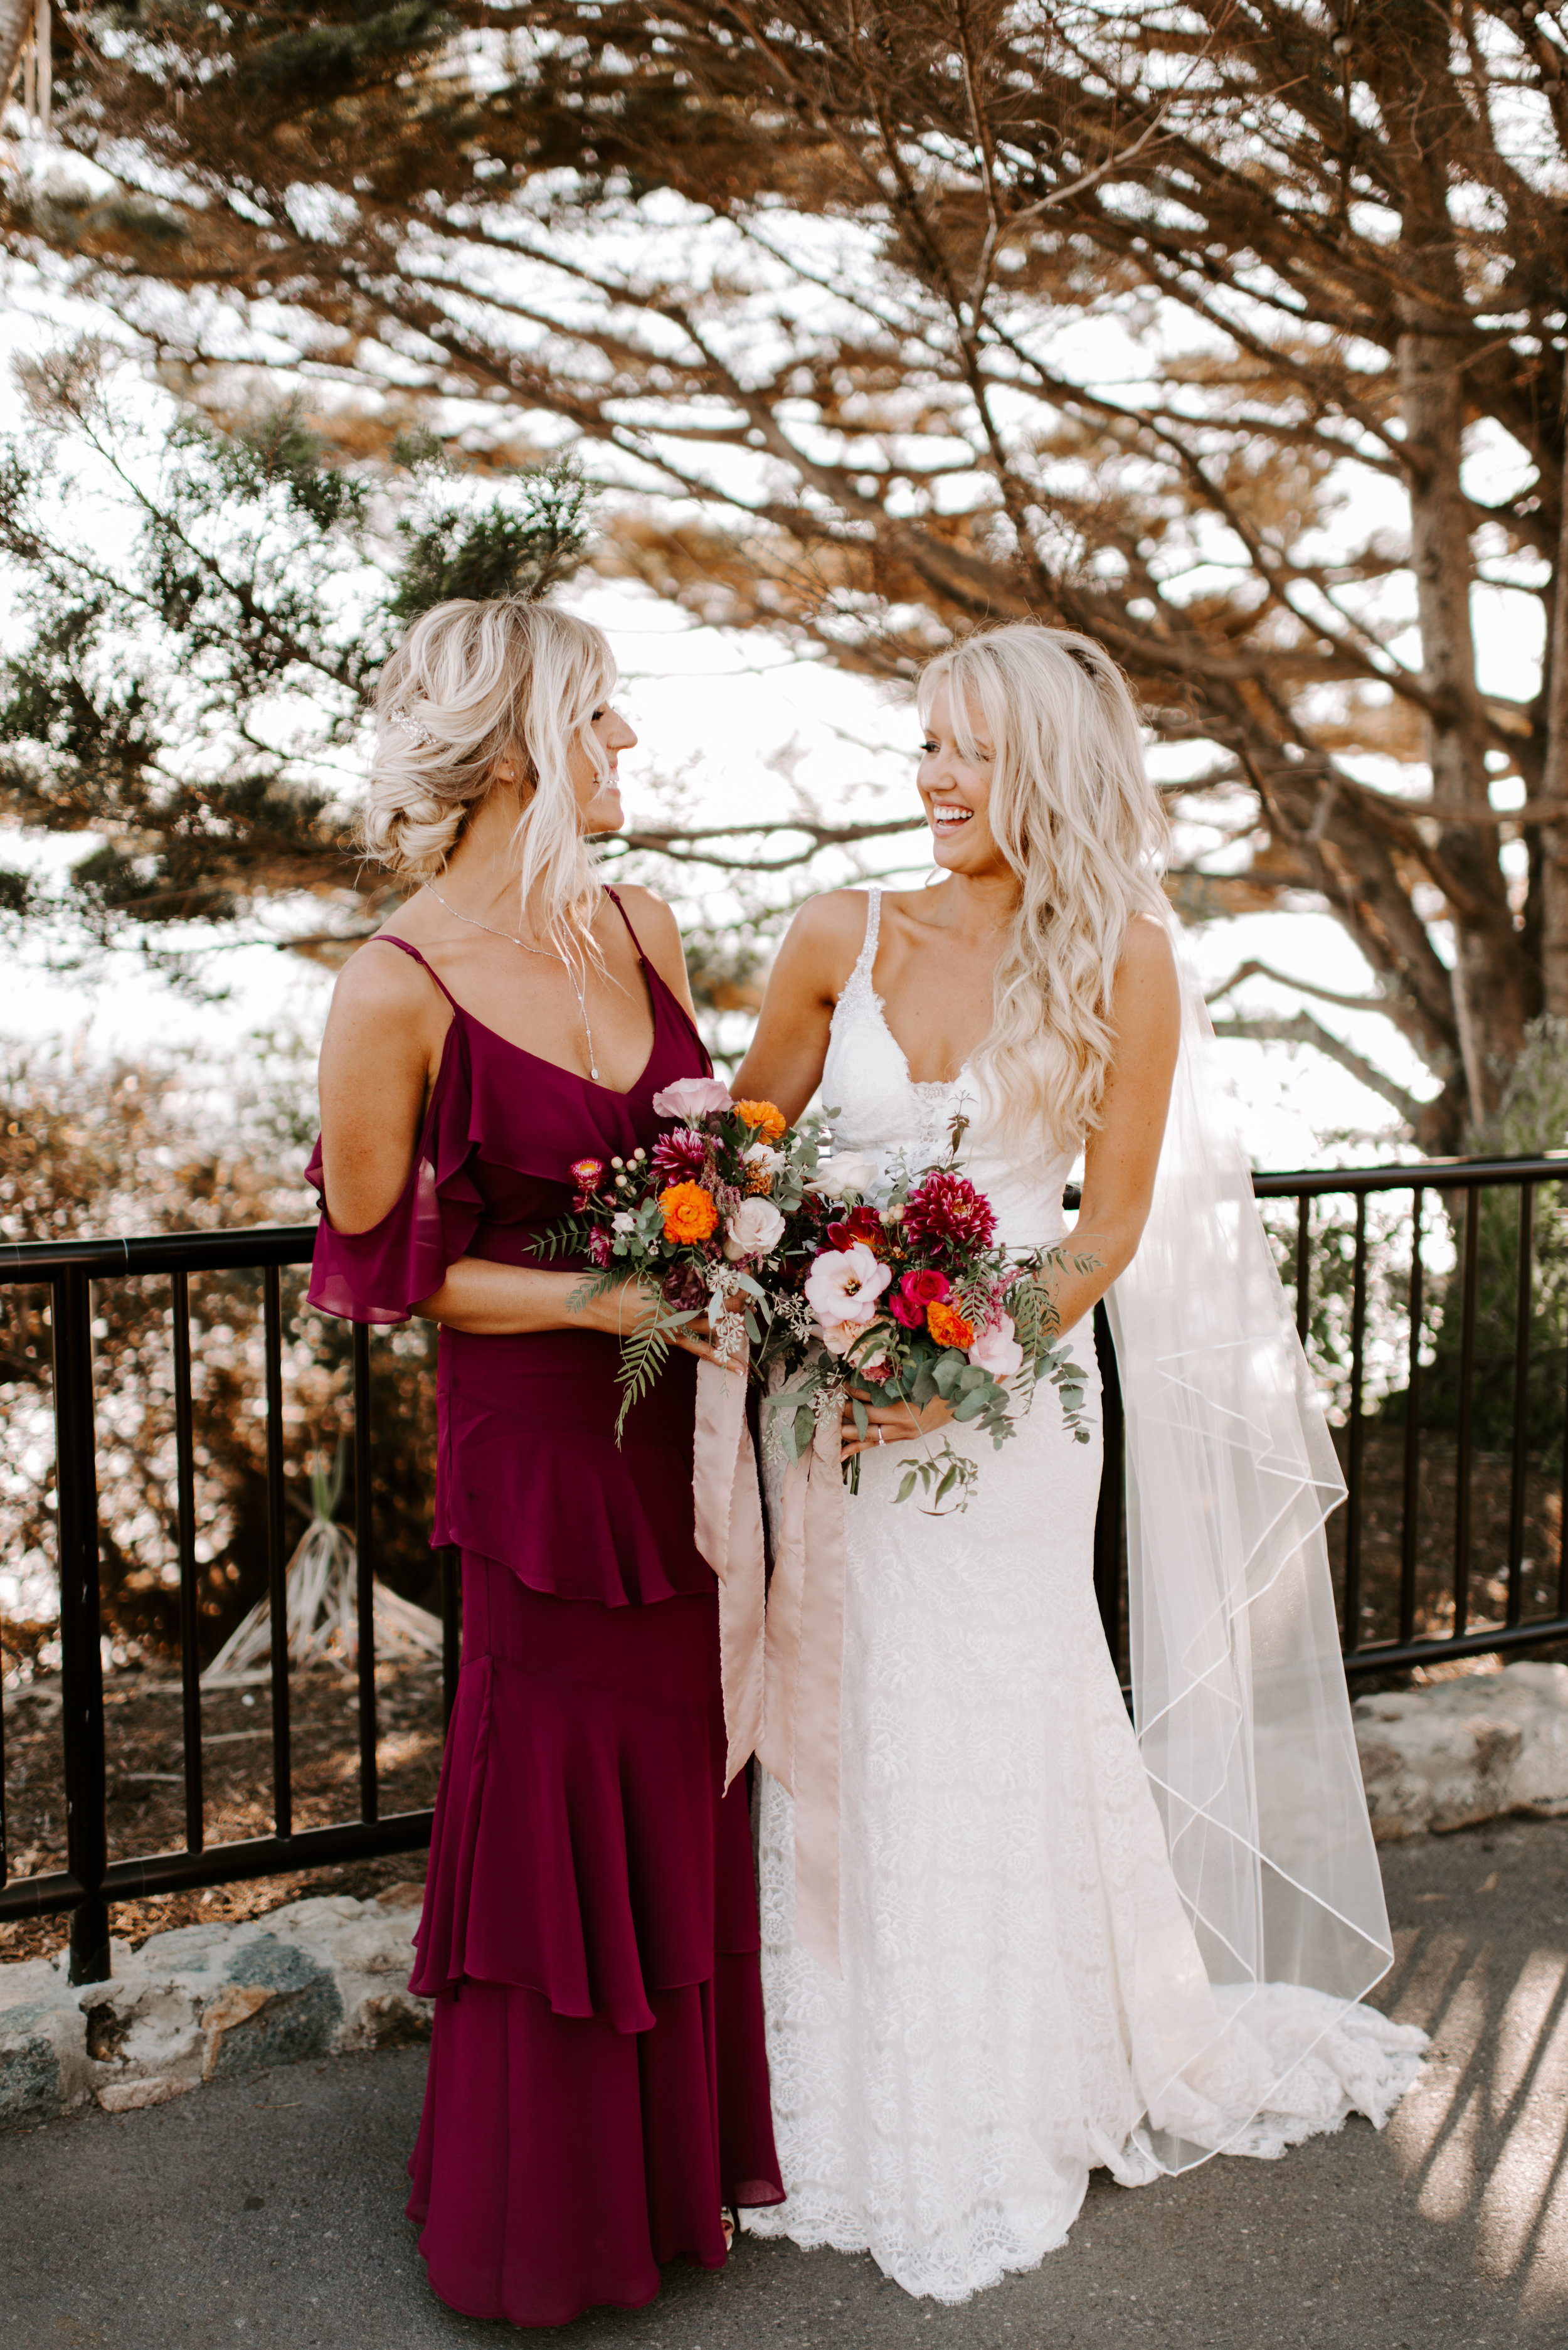 boho wedding hair and natural makeup looks for laguna beach wedding party